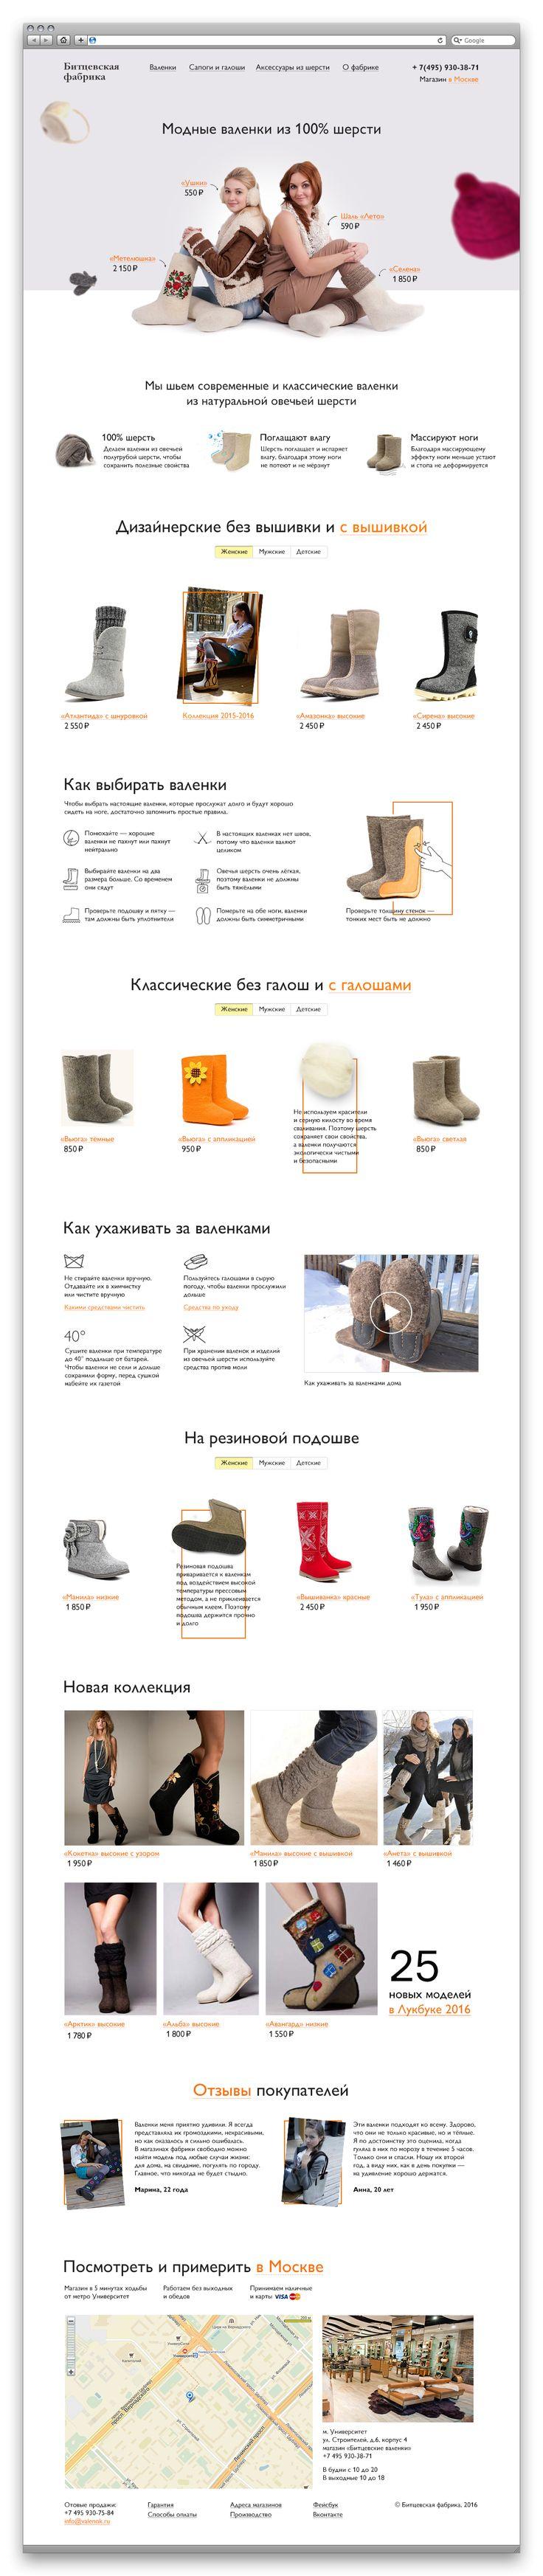 Редизайн сайта фабрики валенок on Behance